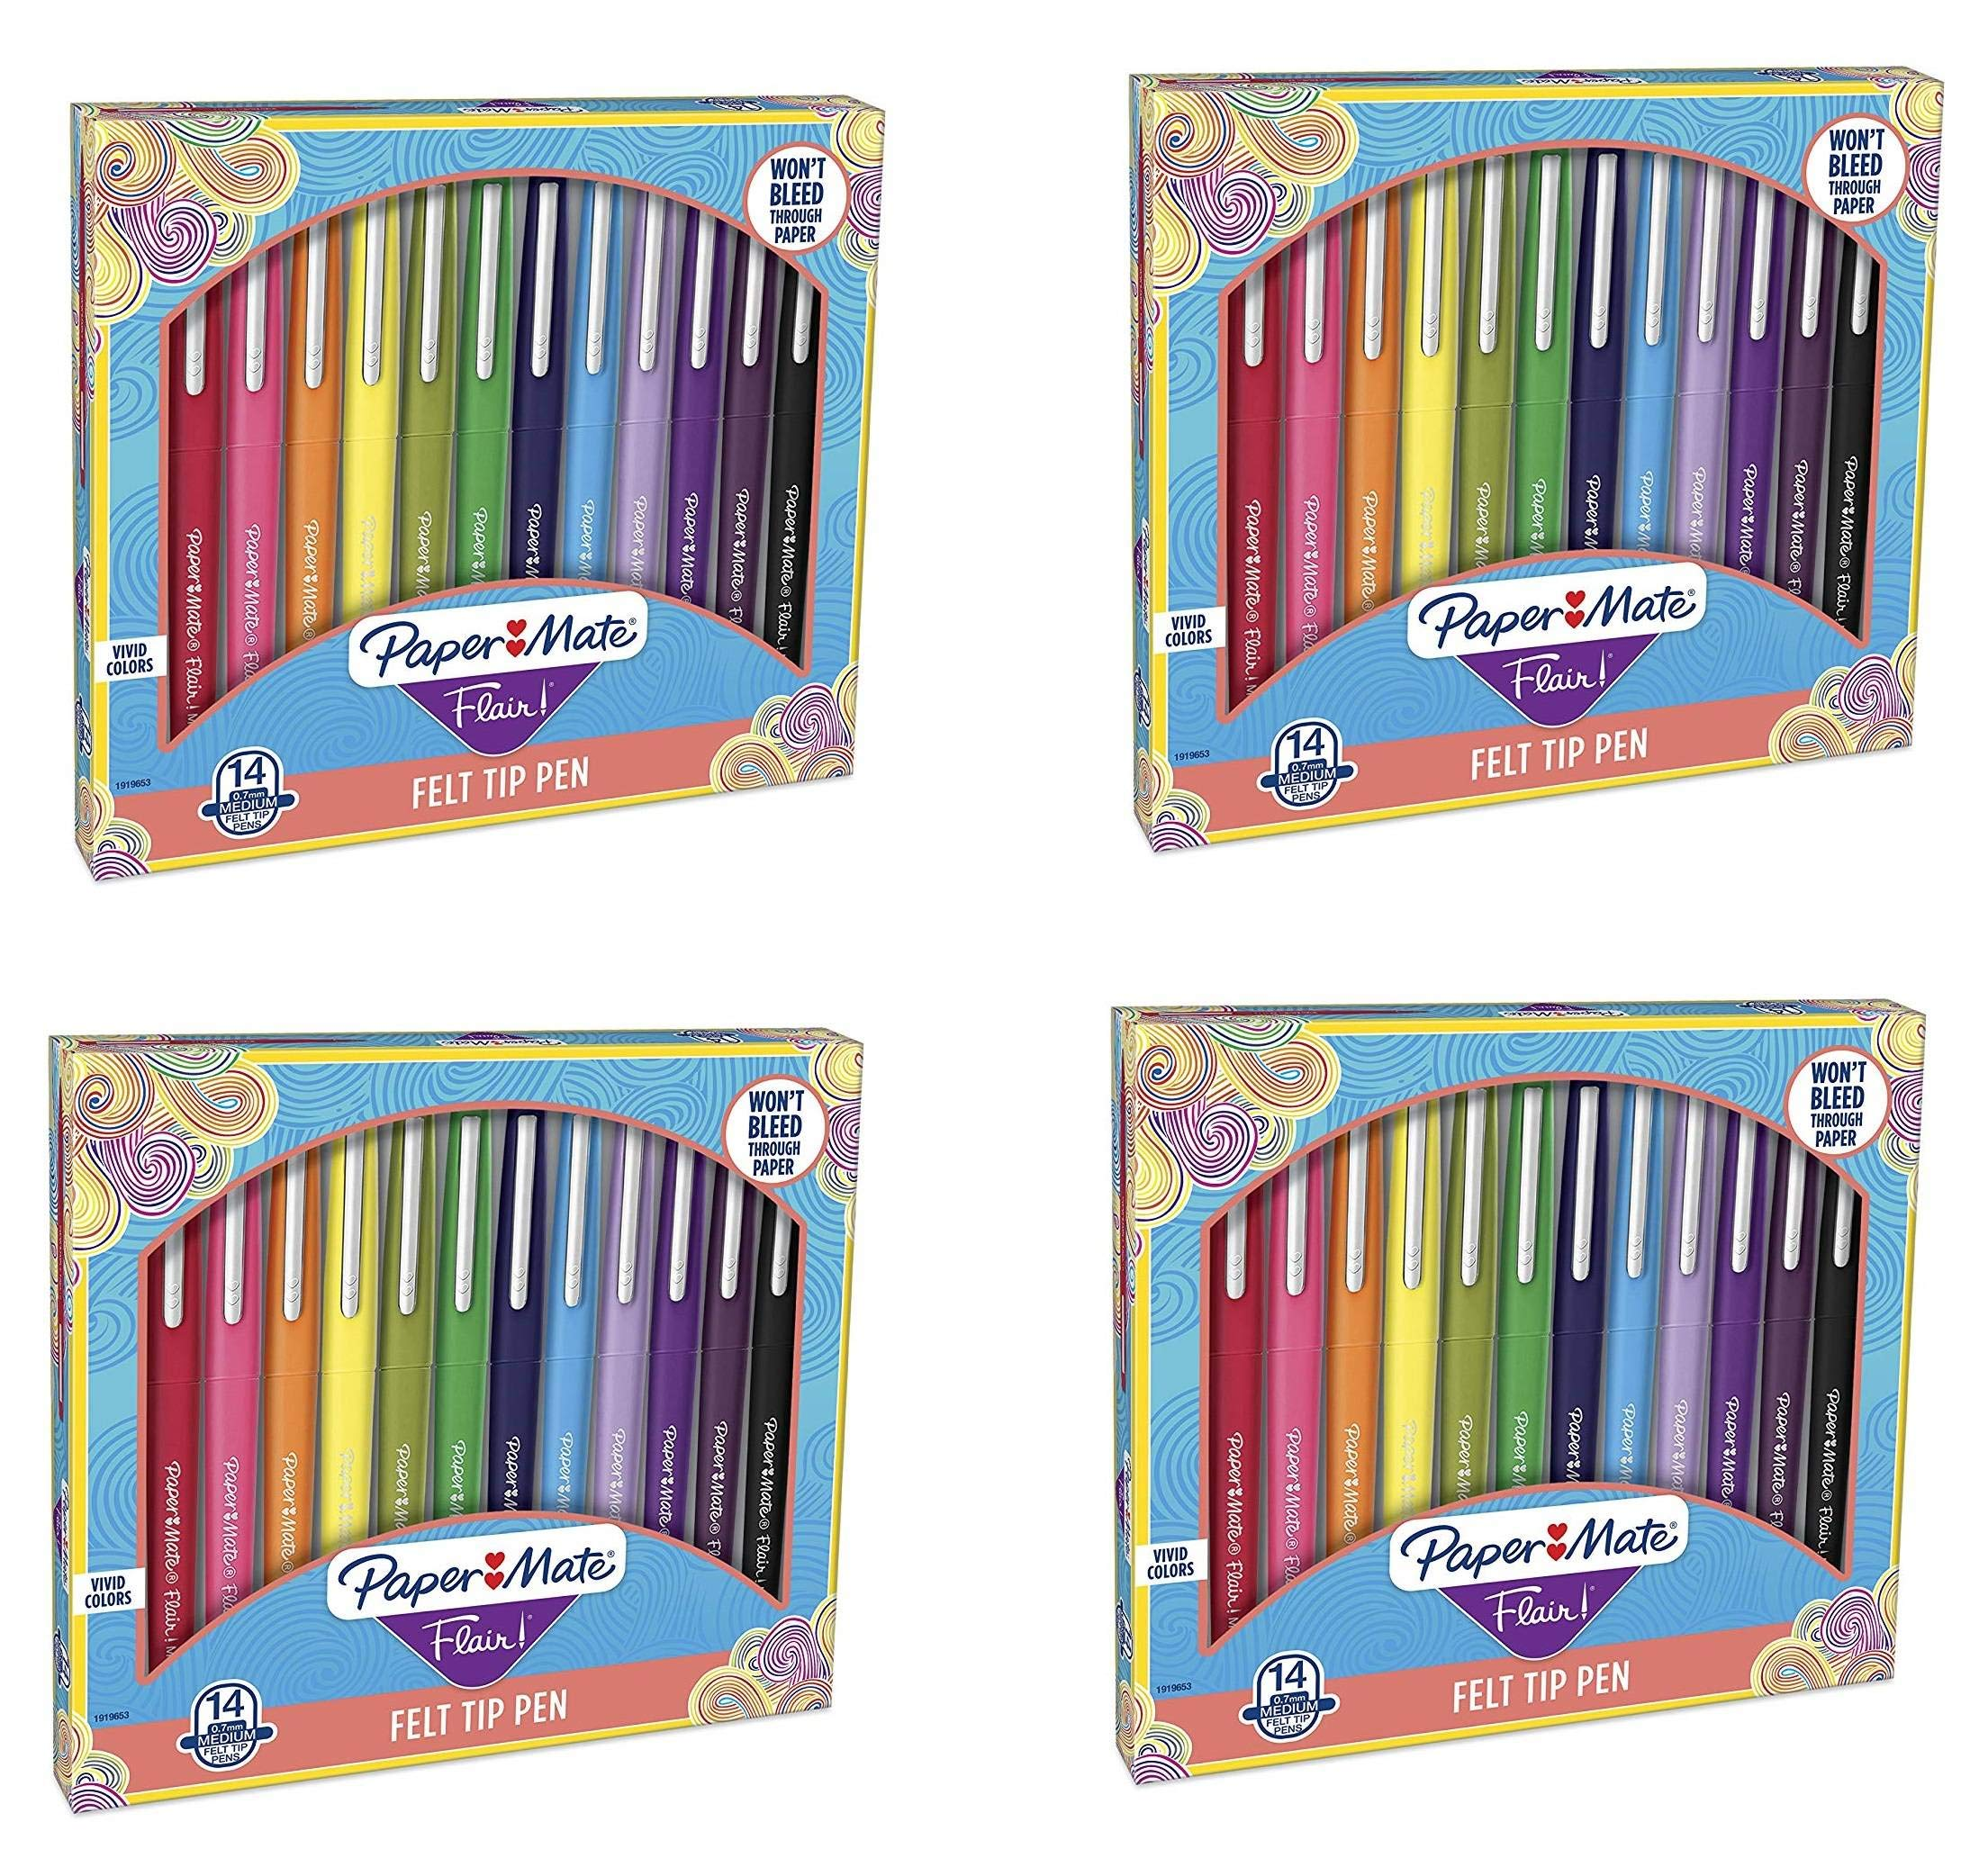 Flair Felt Tip Pens, Medium Point (0.7mm), Assorted Colors, KCRudc 14 Count